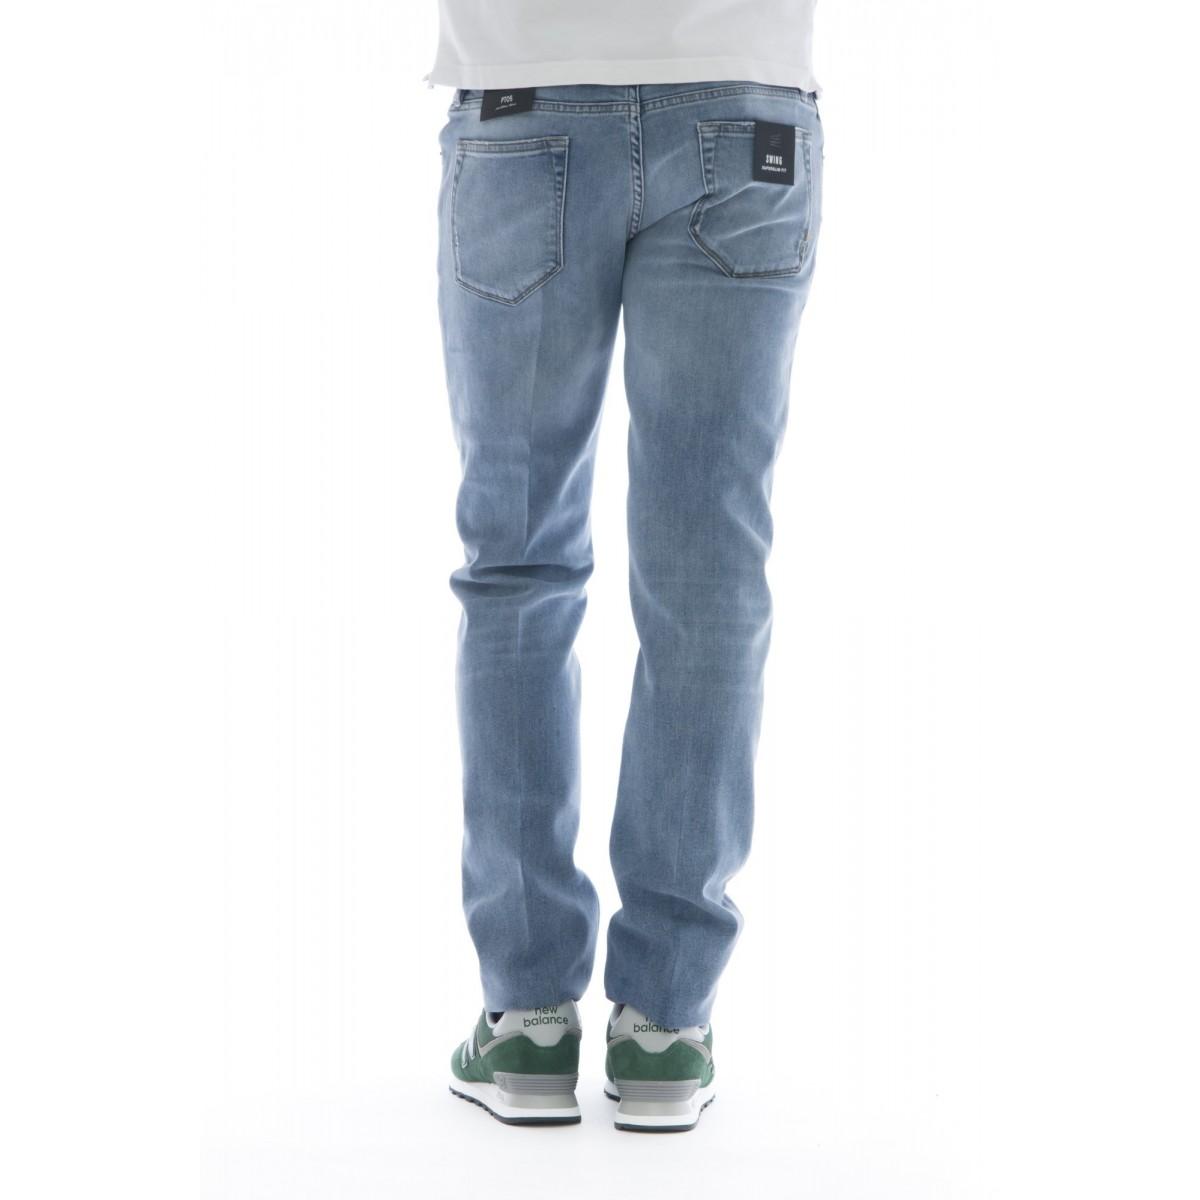 Jeans - Swing c6dj25z10min tx04 jeans super slim